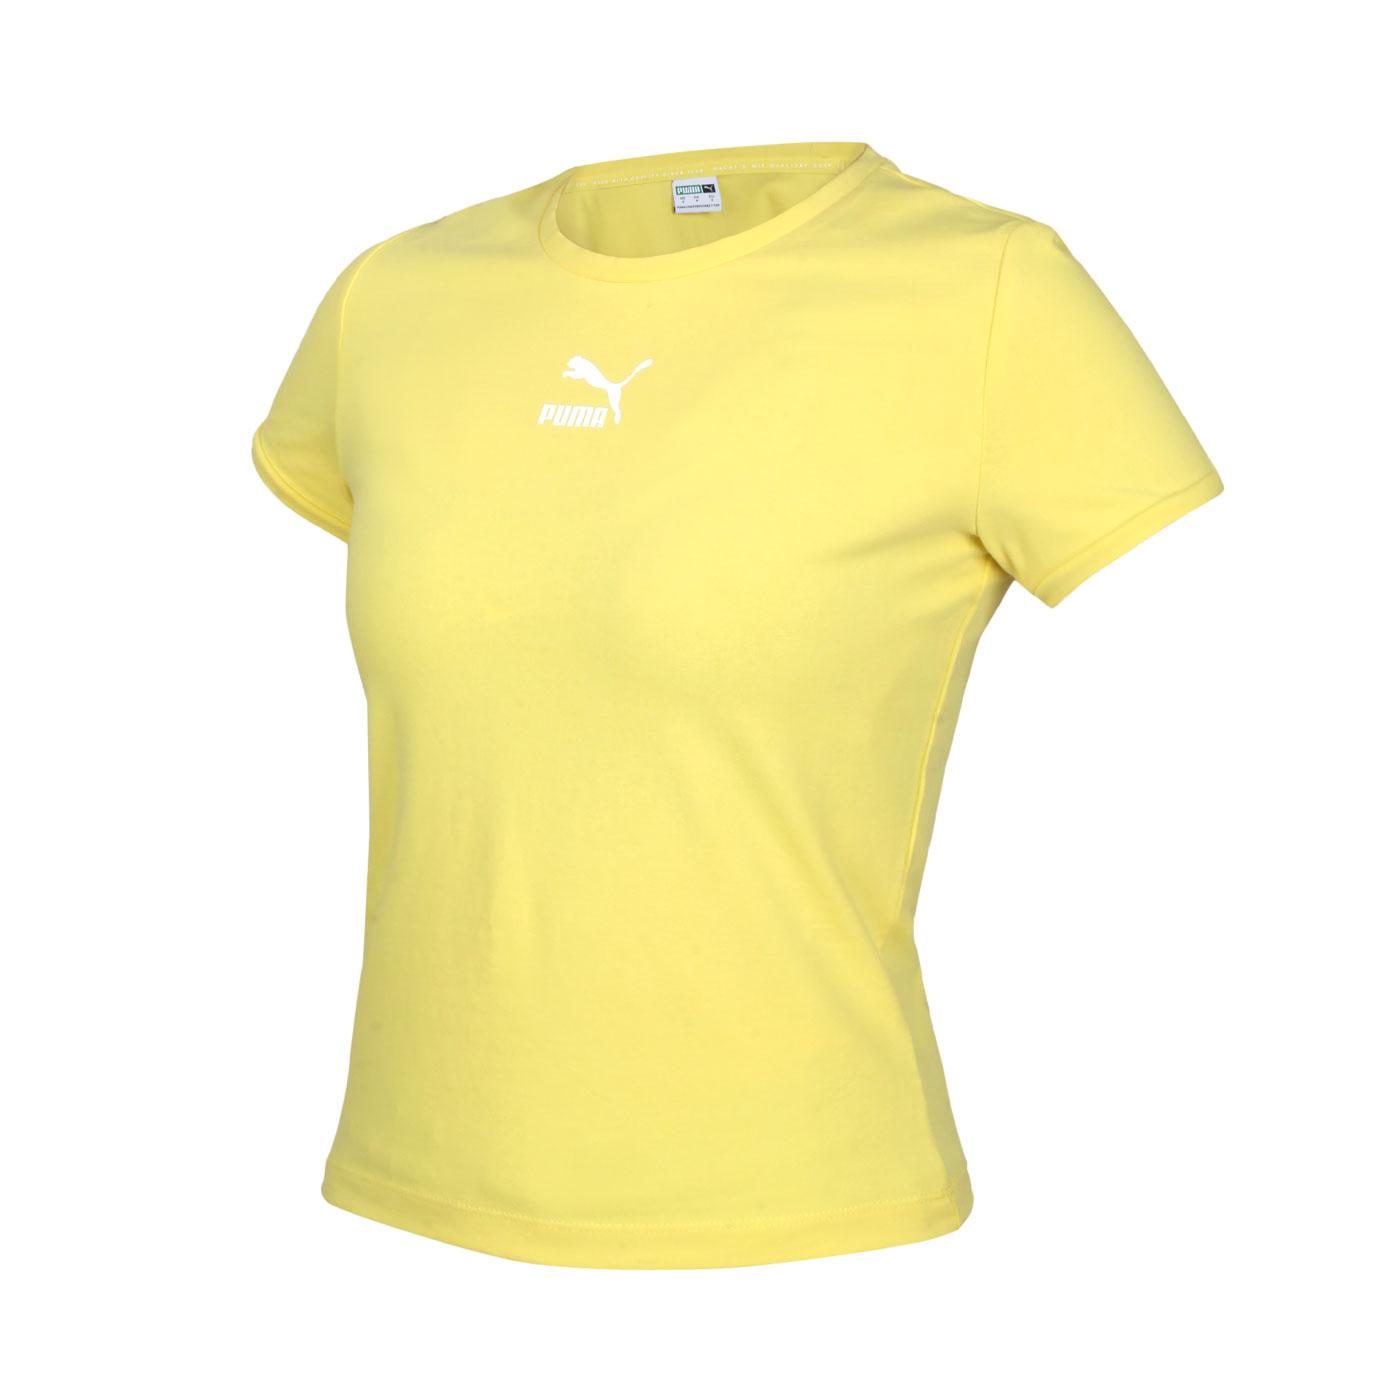 PUMA 女款基本系列Classics貼身短袖T恤 59957738 - 黃白